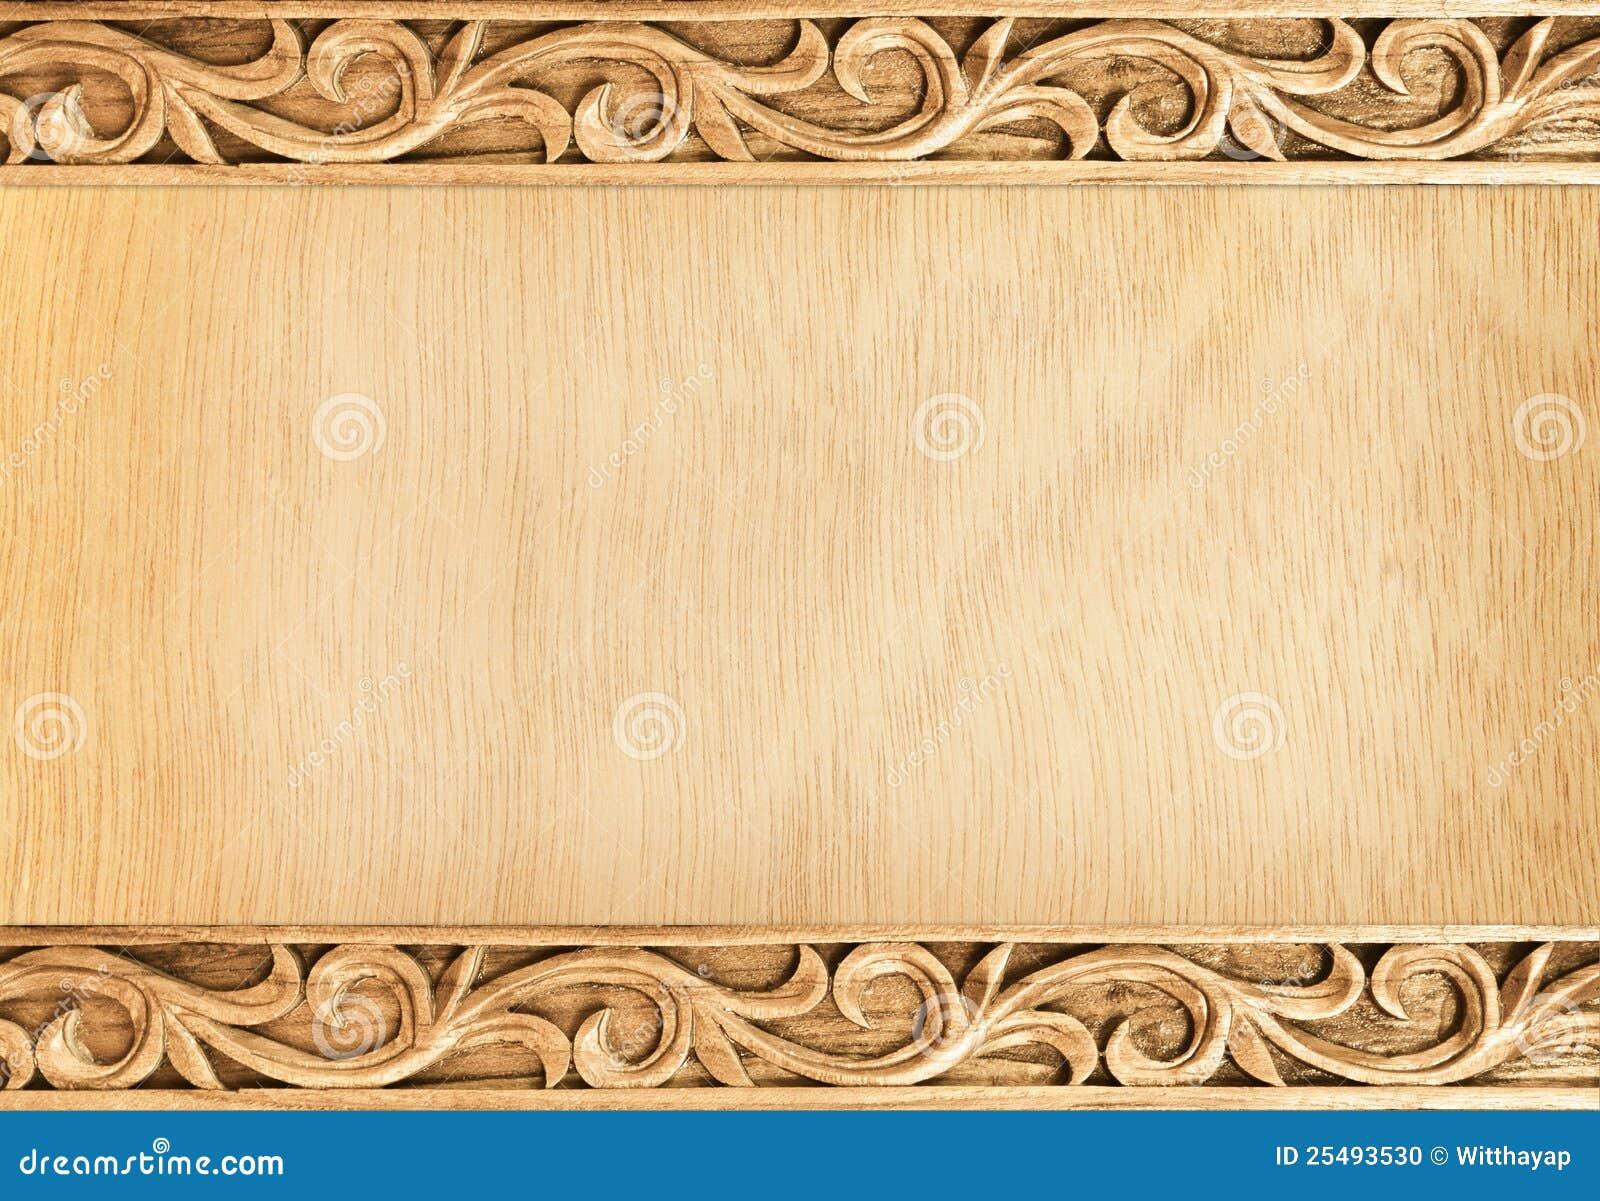 Flower Carved Frame Stock Photo Image Of Natural Image